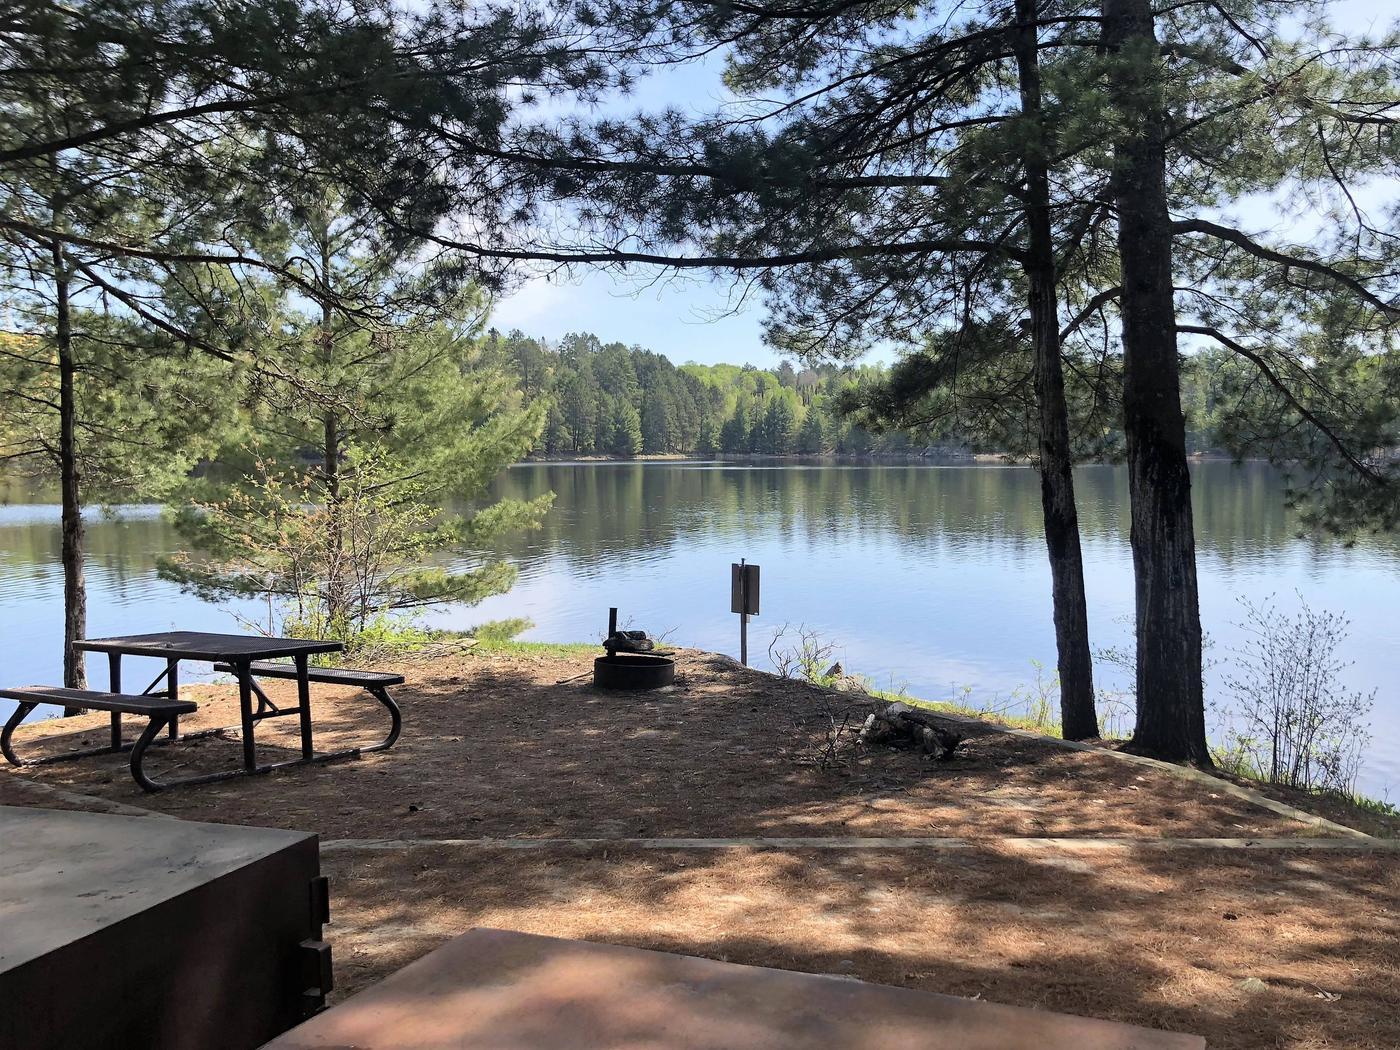 K19 - Lost LakeK19 - Lost Lake campsite on Kabetogama Lake